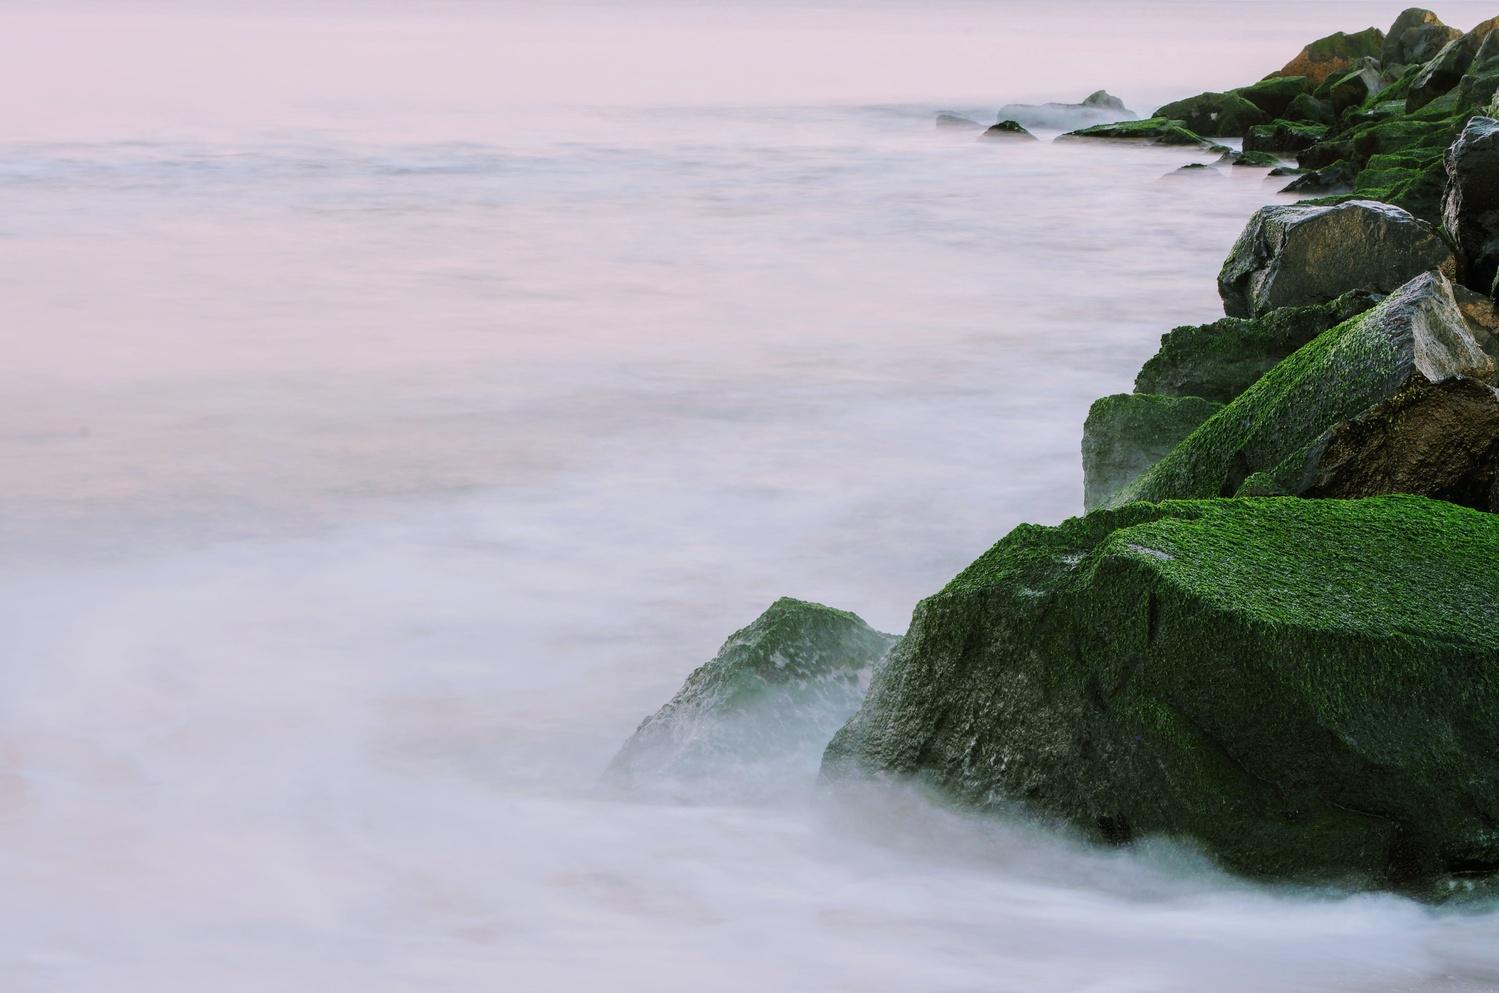 Green Turmoil by Reed Page